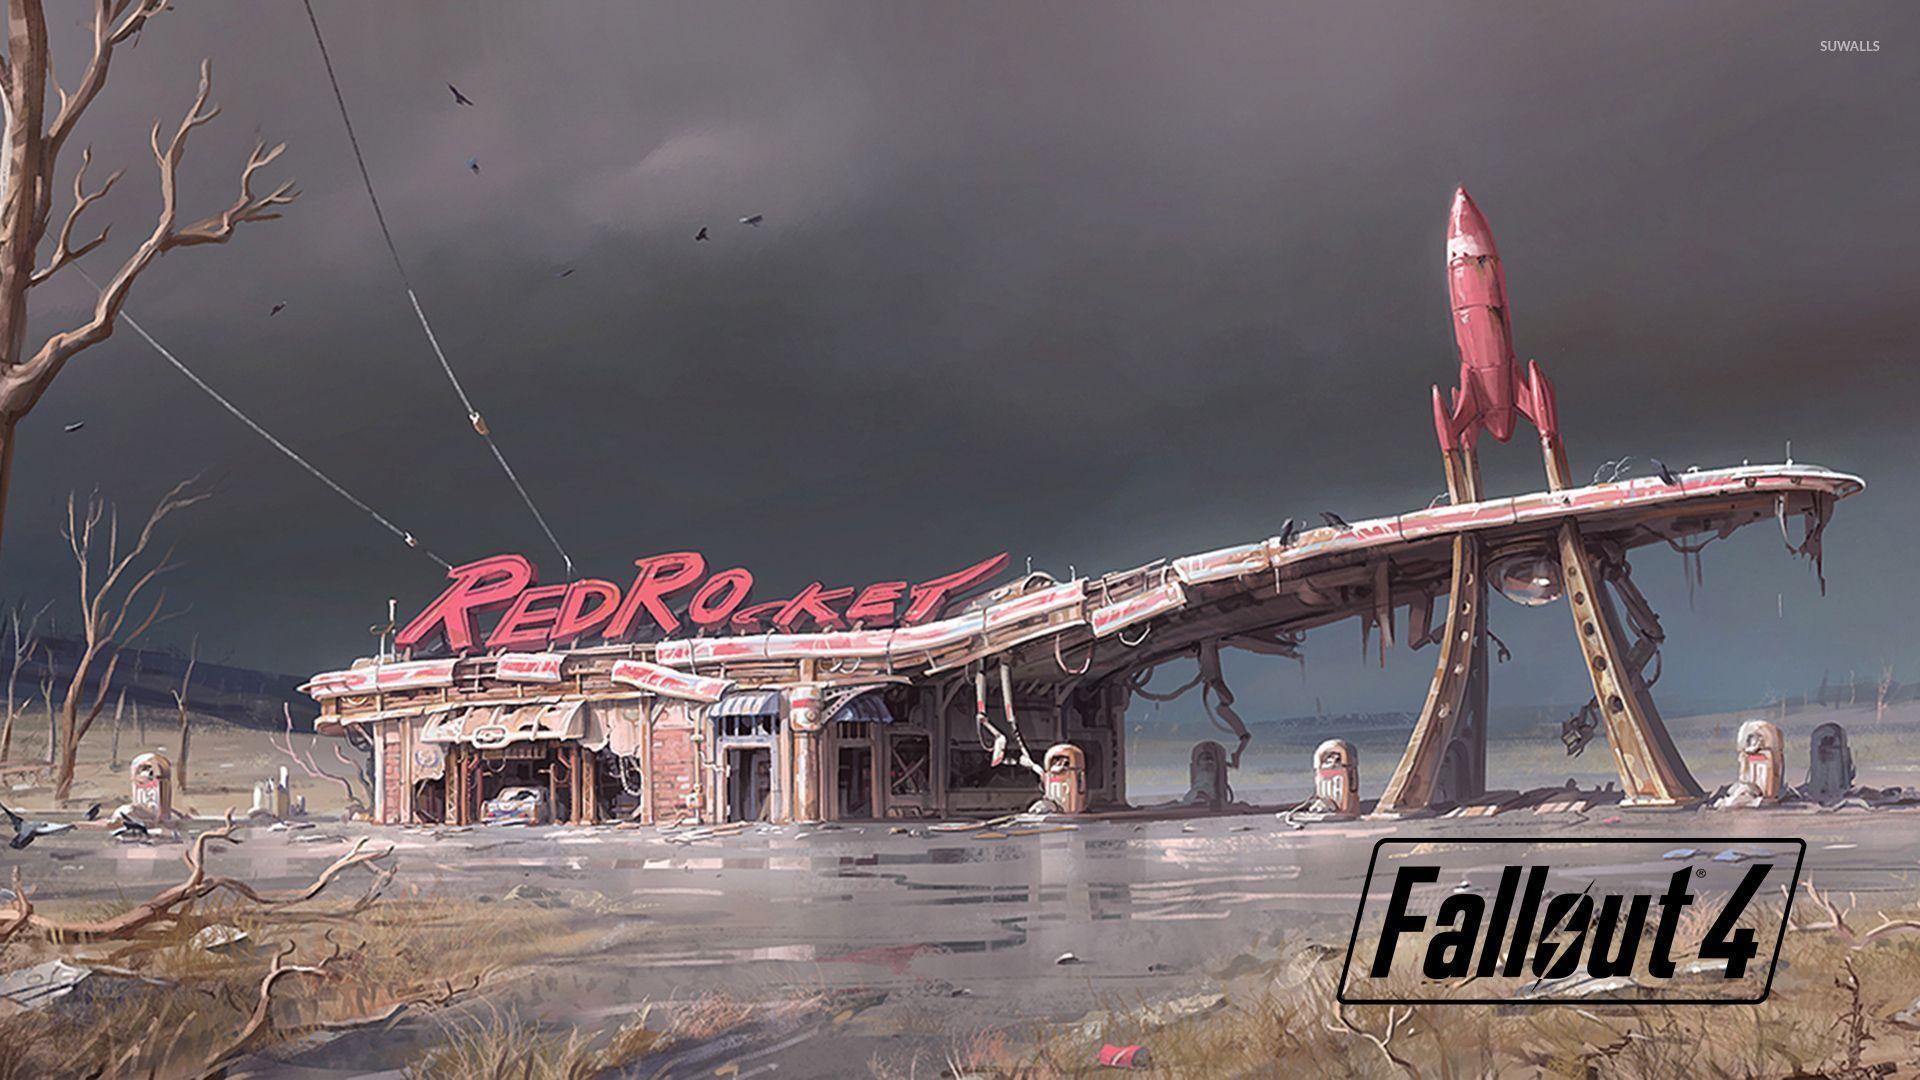 CE: Fallout 4 Wallpaper 4K, 41+ Beautiful Fallout 4 4K Wallpapers